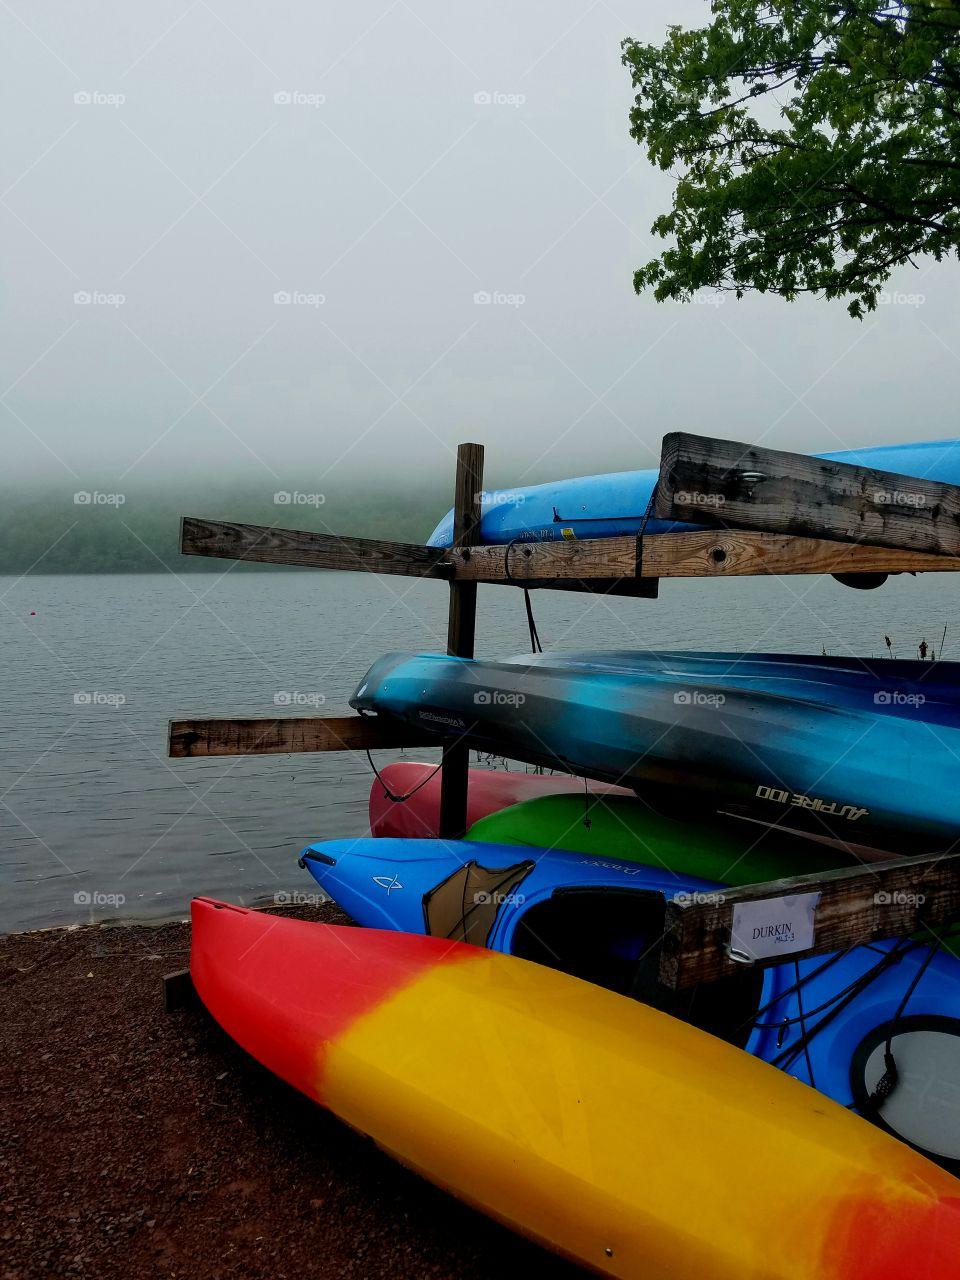 colorful rack of kayaks on foggy lake in morning